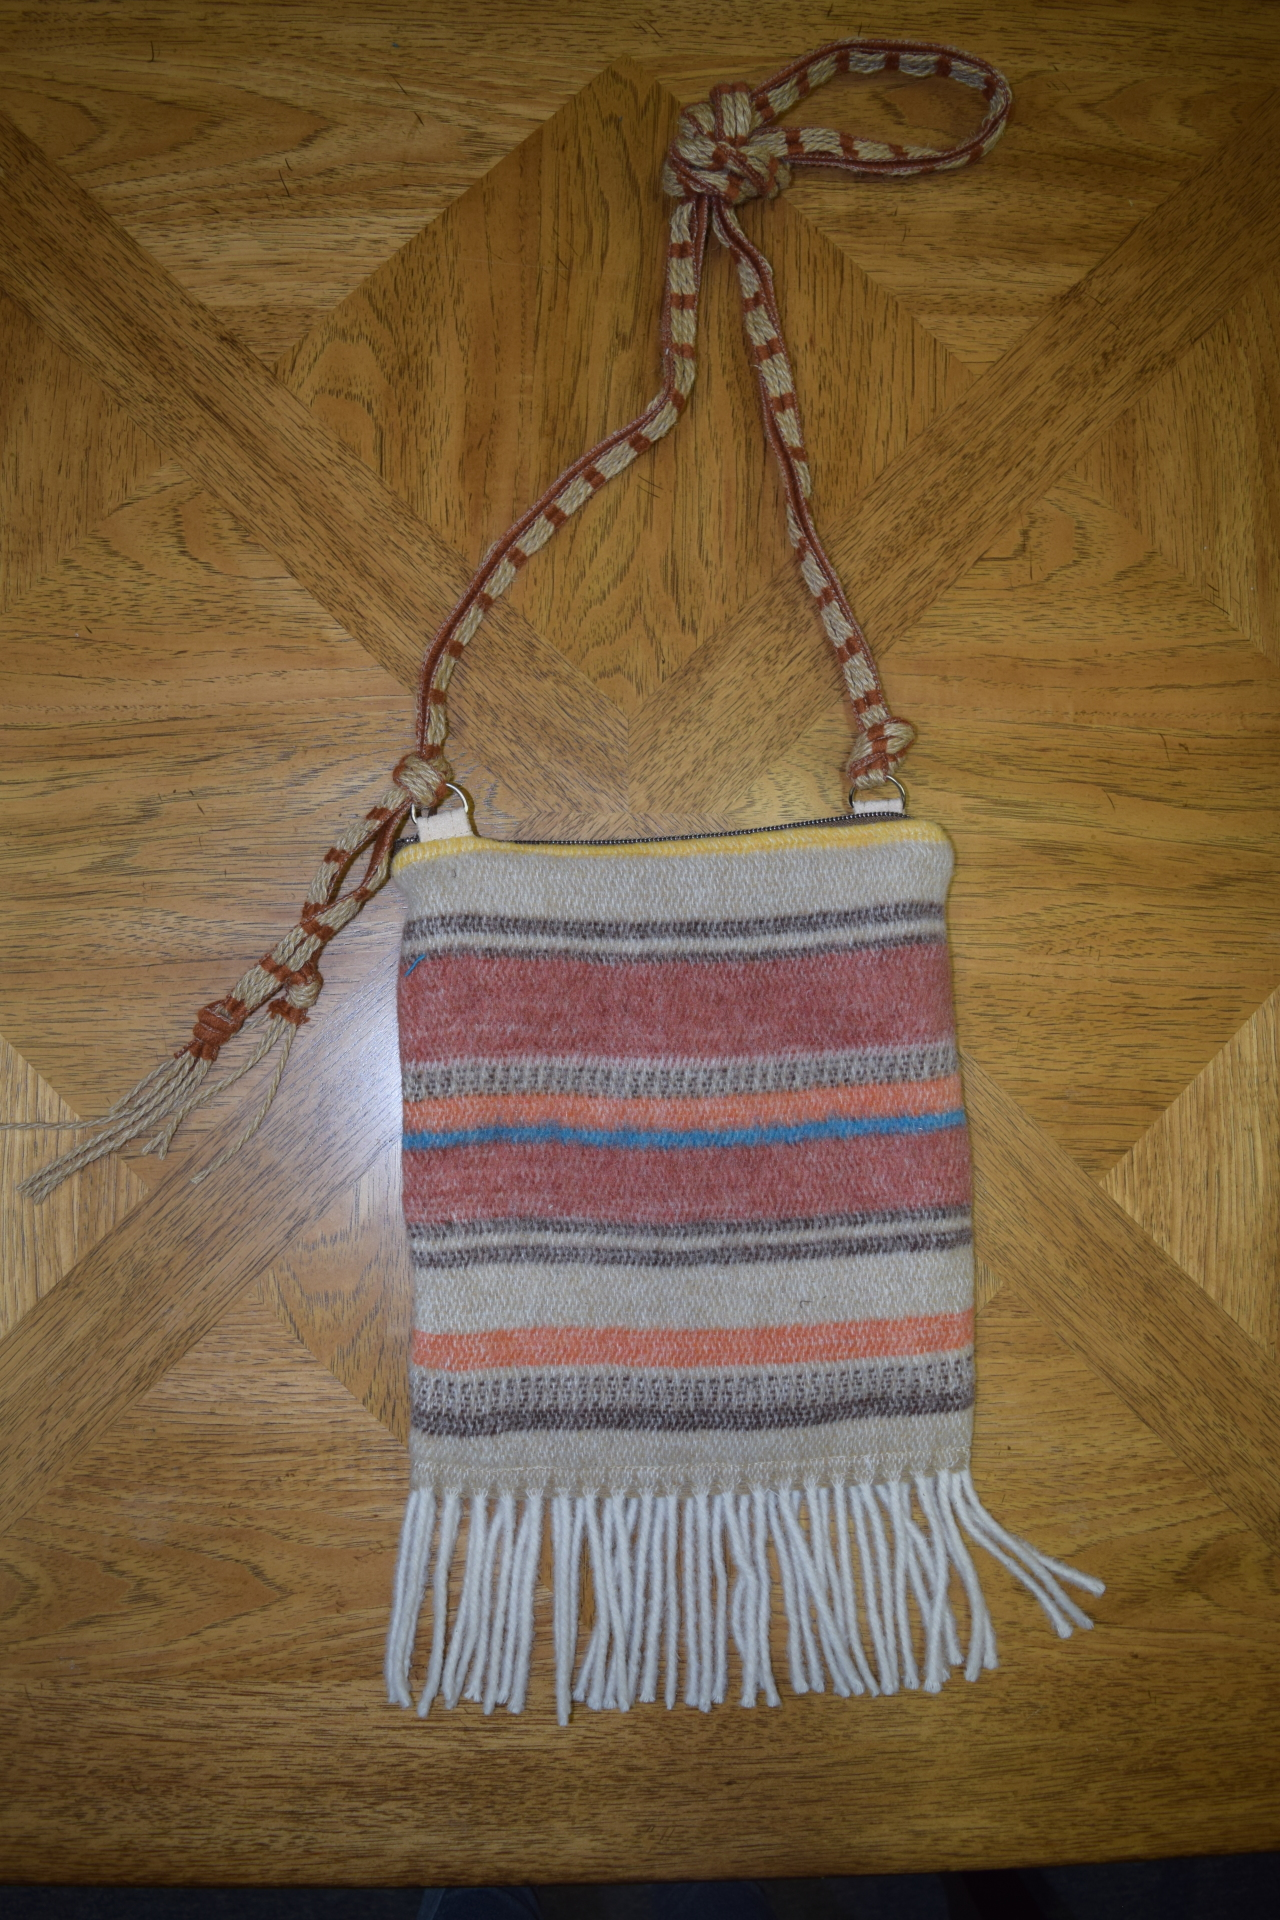 #B07 ARAPAHOE FRINGE ZIP BAG - $89.95